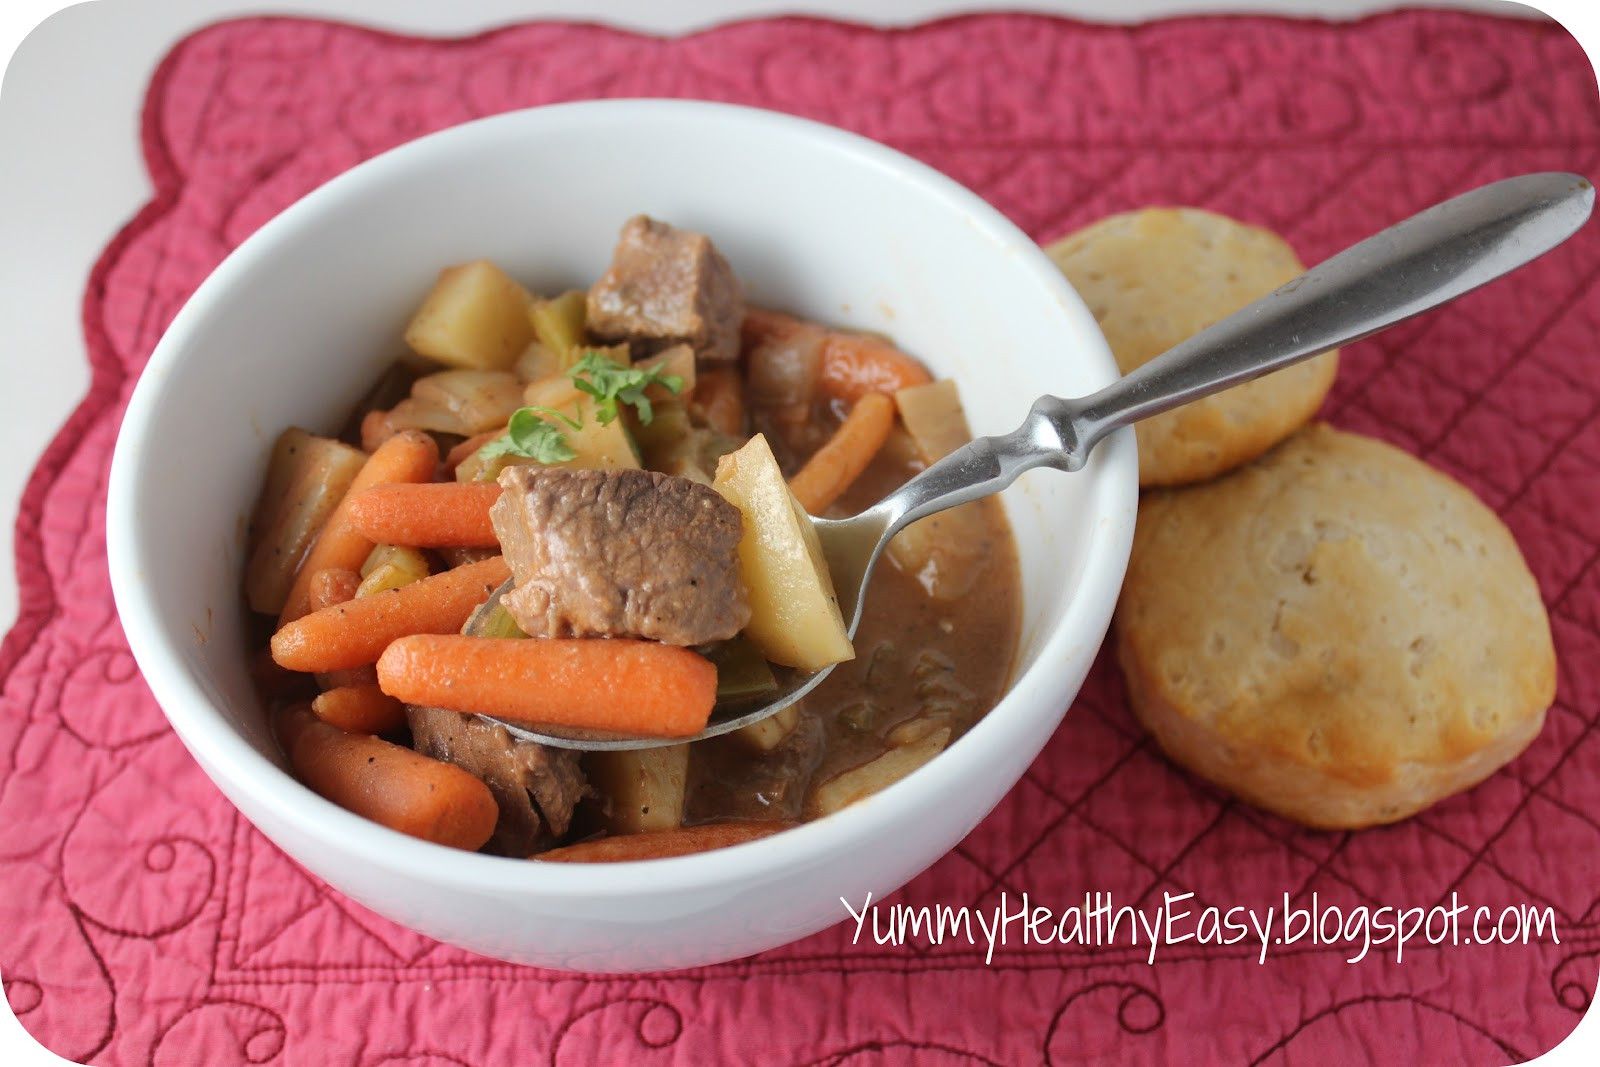 Healthy Beef Stew Crock Pot Recipes  Easy Crock Pot Beef Stew Yummy Healthy Easy